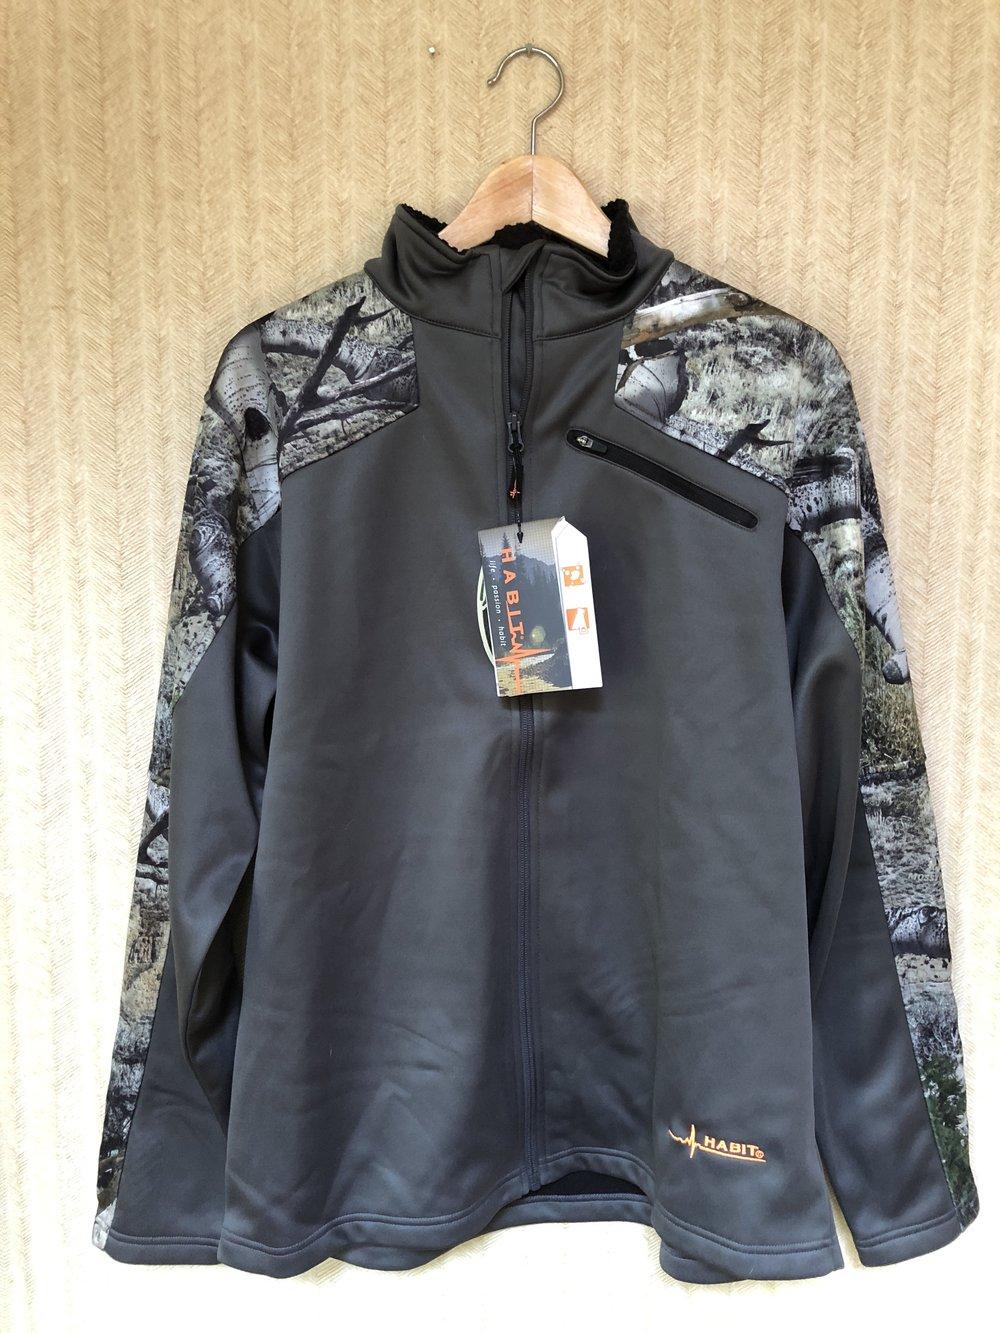 Mahco Inc - Habit Camo Jacket.JPG